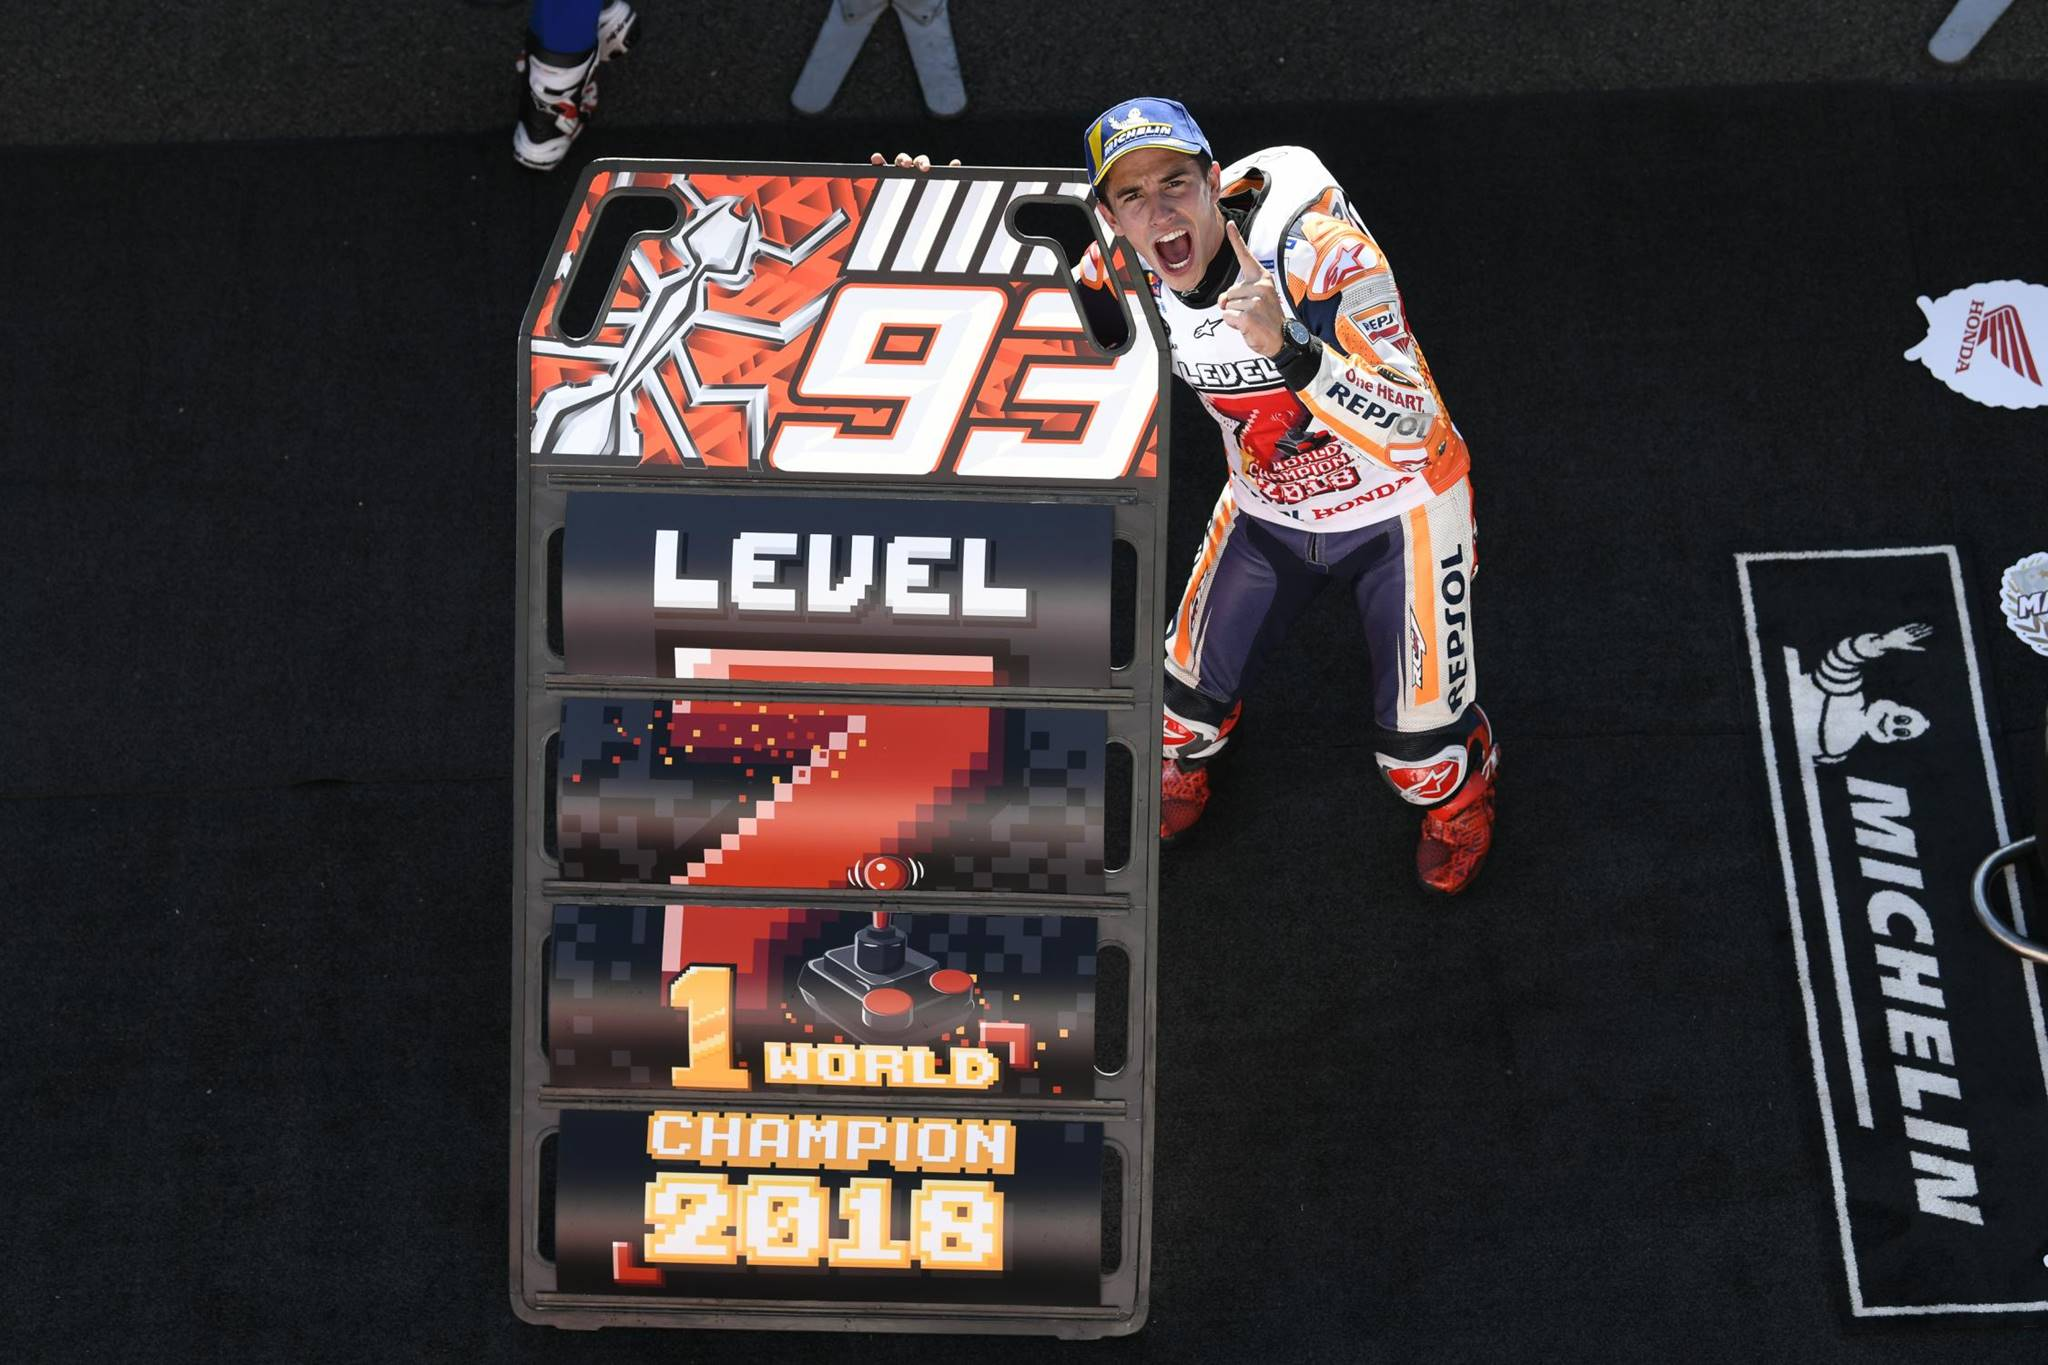 MotoGP_2018_JapaneseGP_Xe_Tinhte_023.jpg